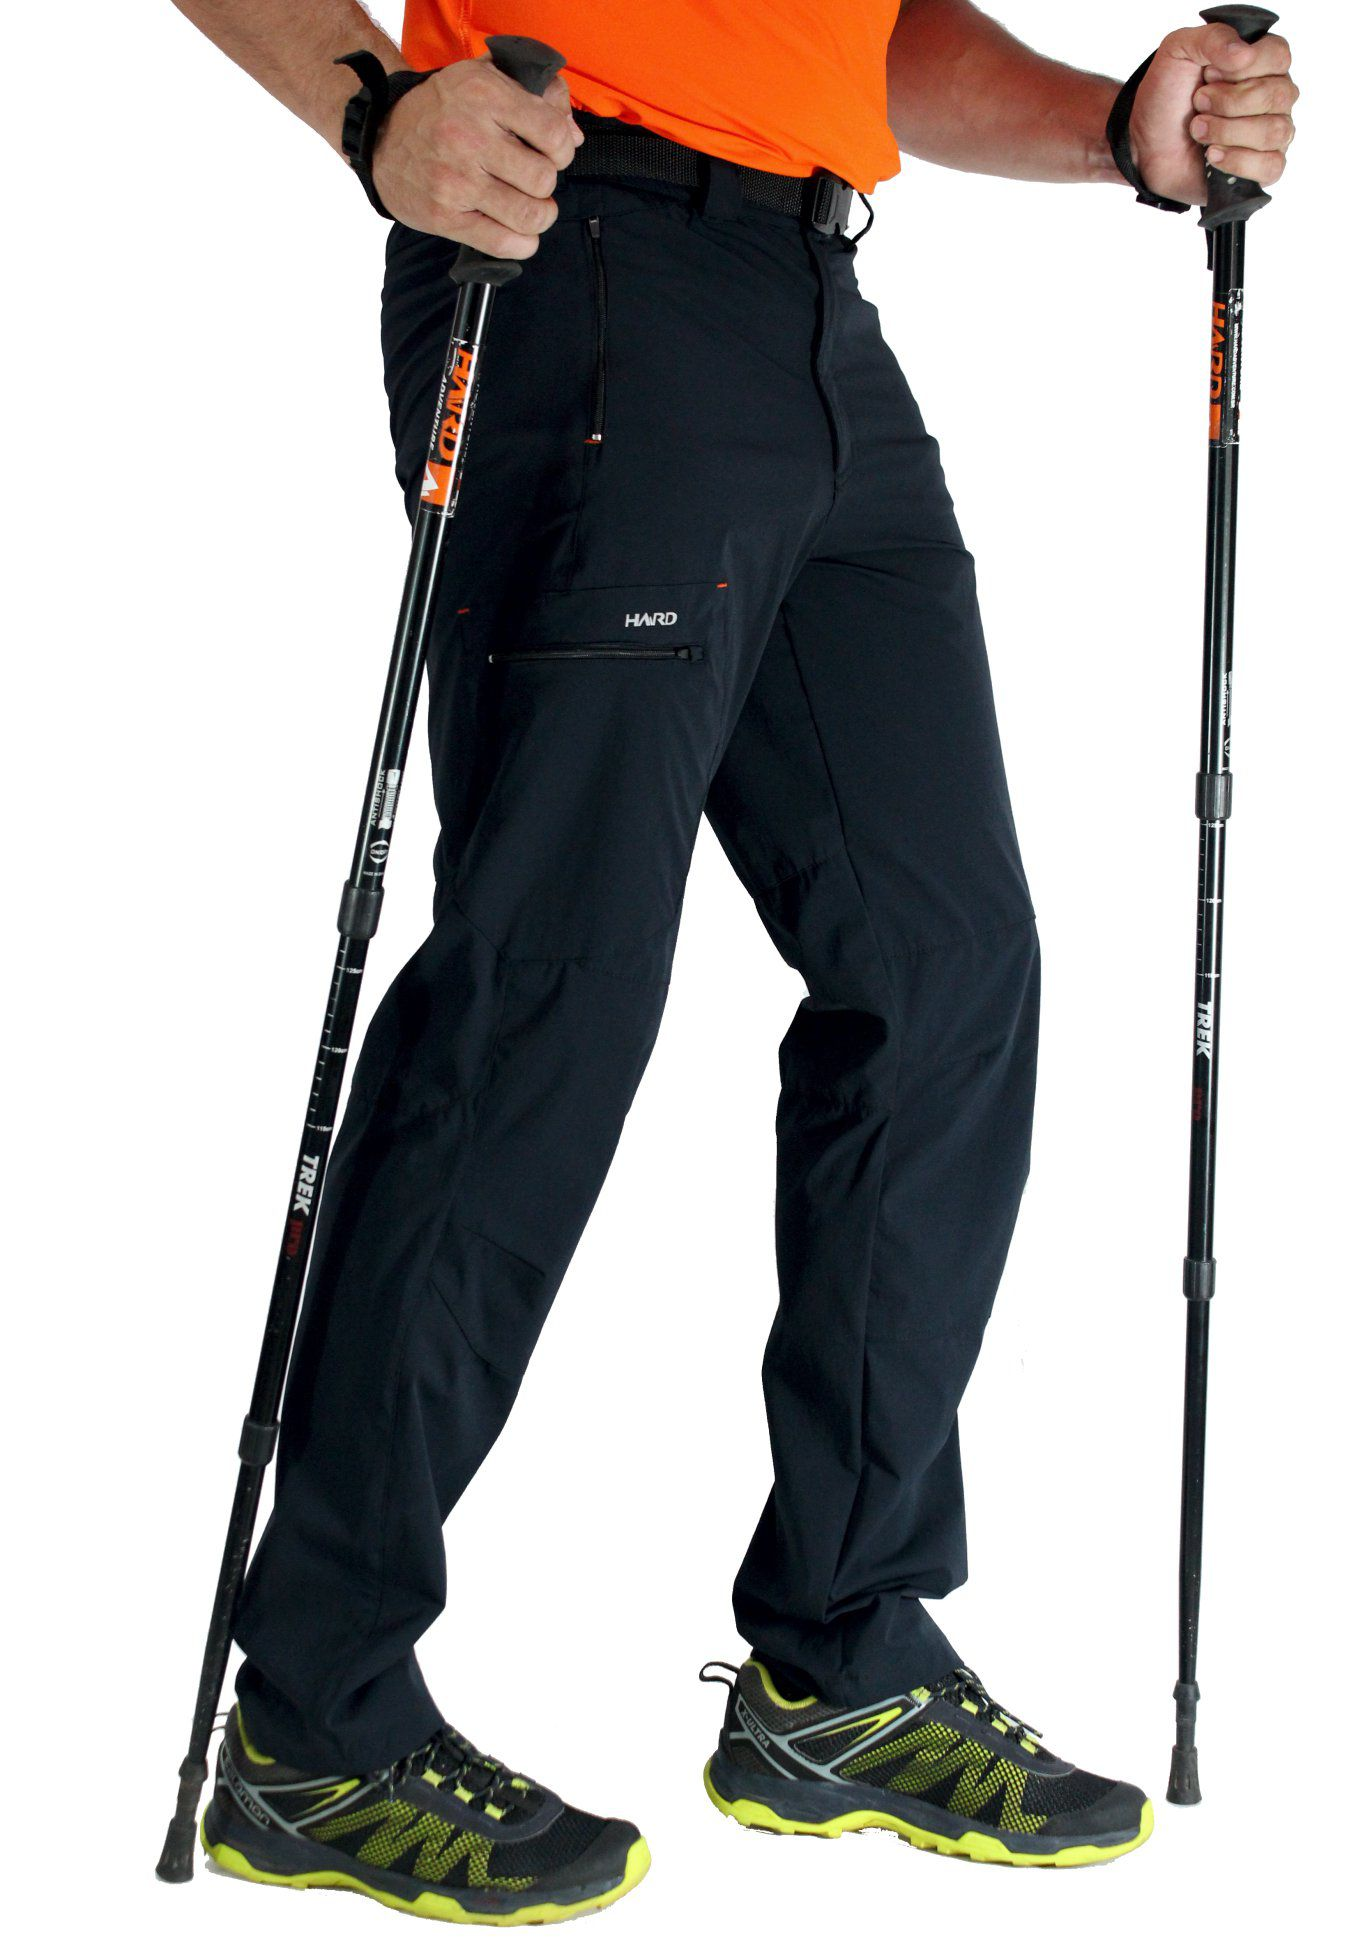 Calça Masculina Hard Elastic Summit – Coleção Trekking and Mountain 2020  - Preta